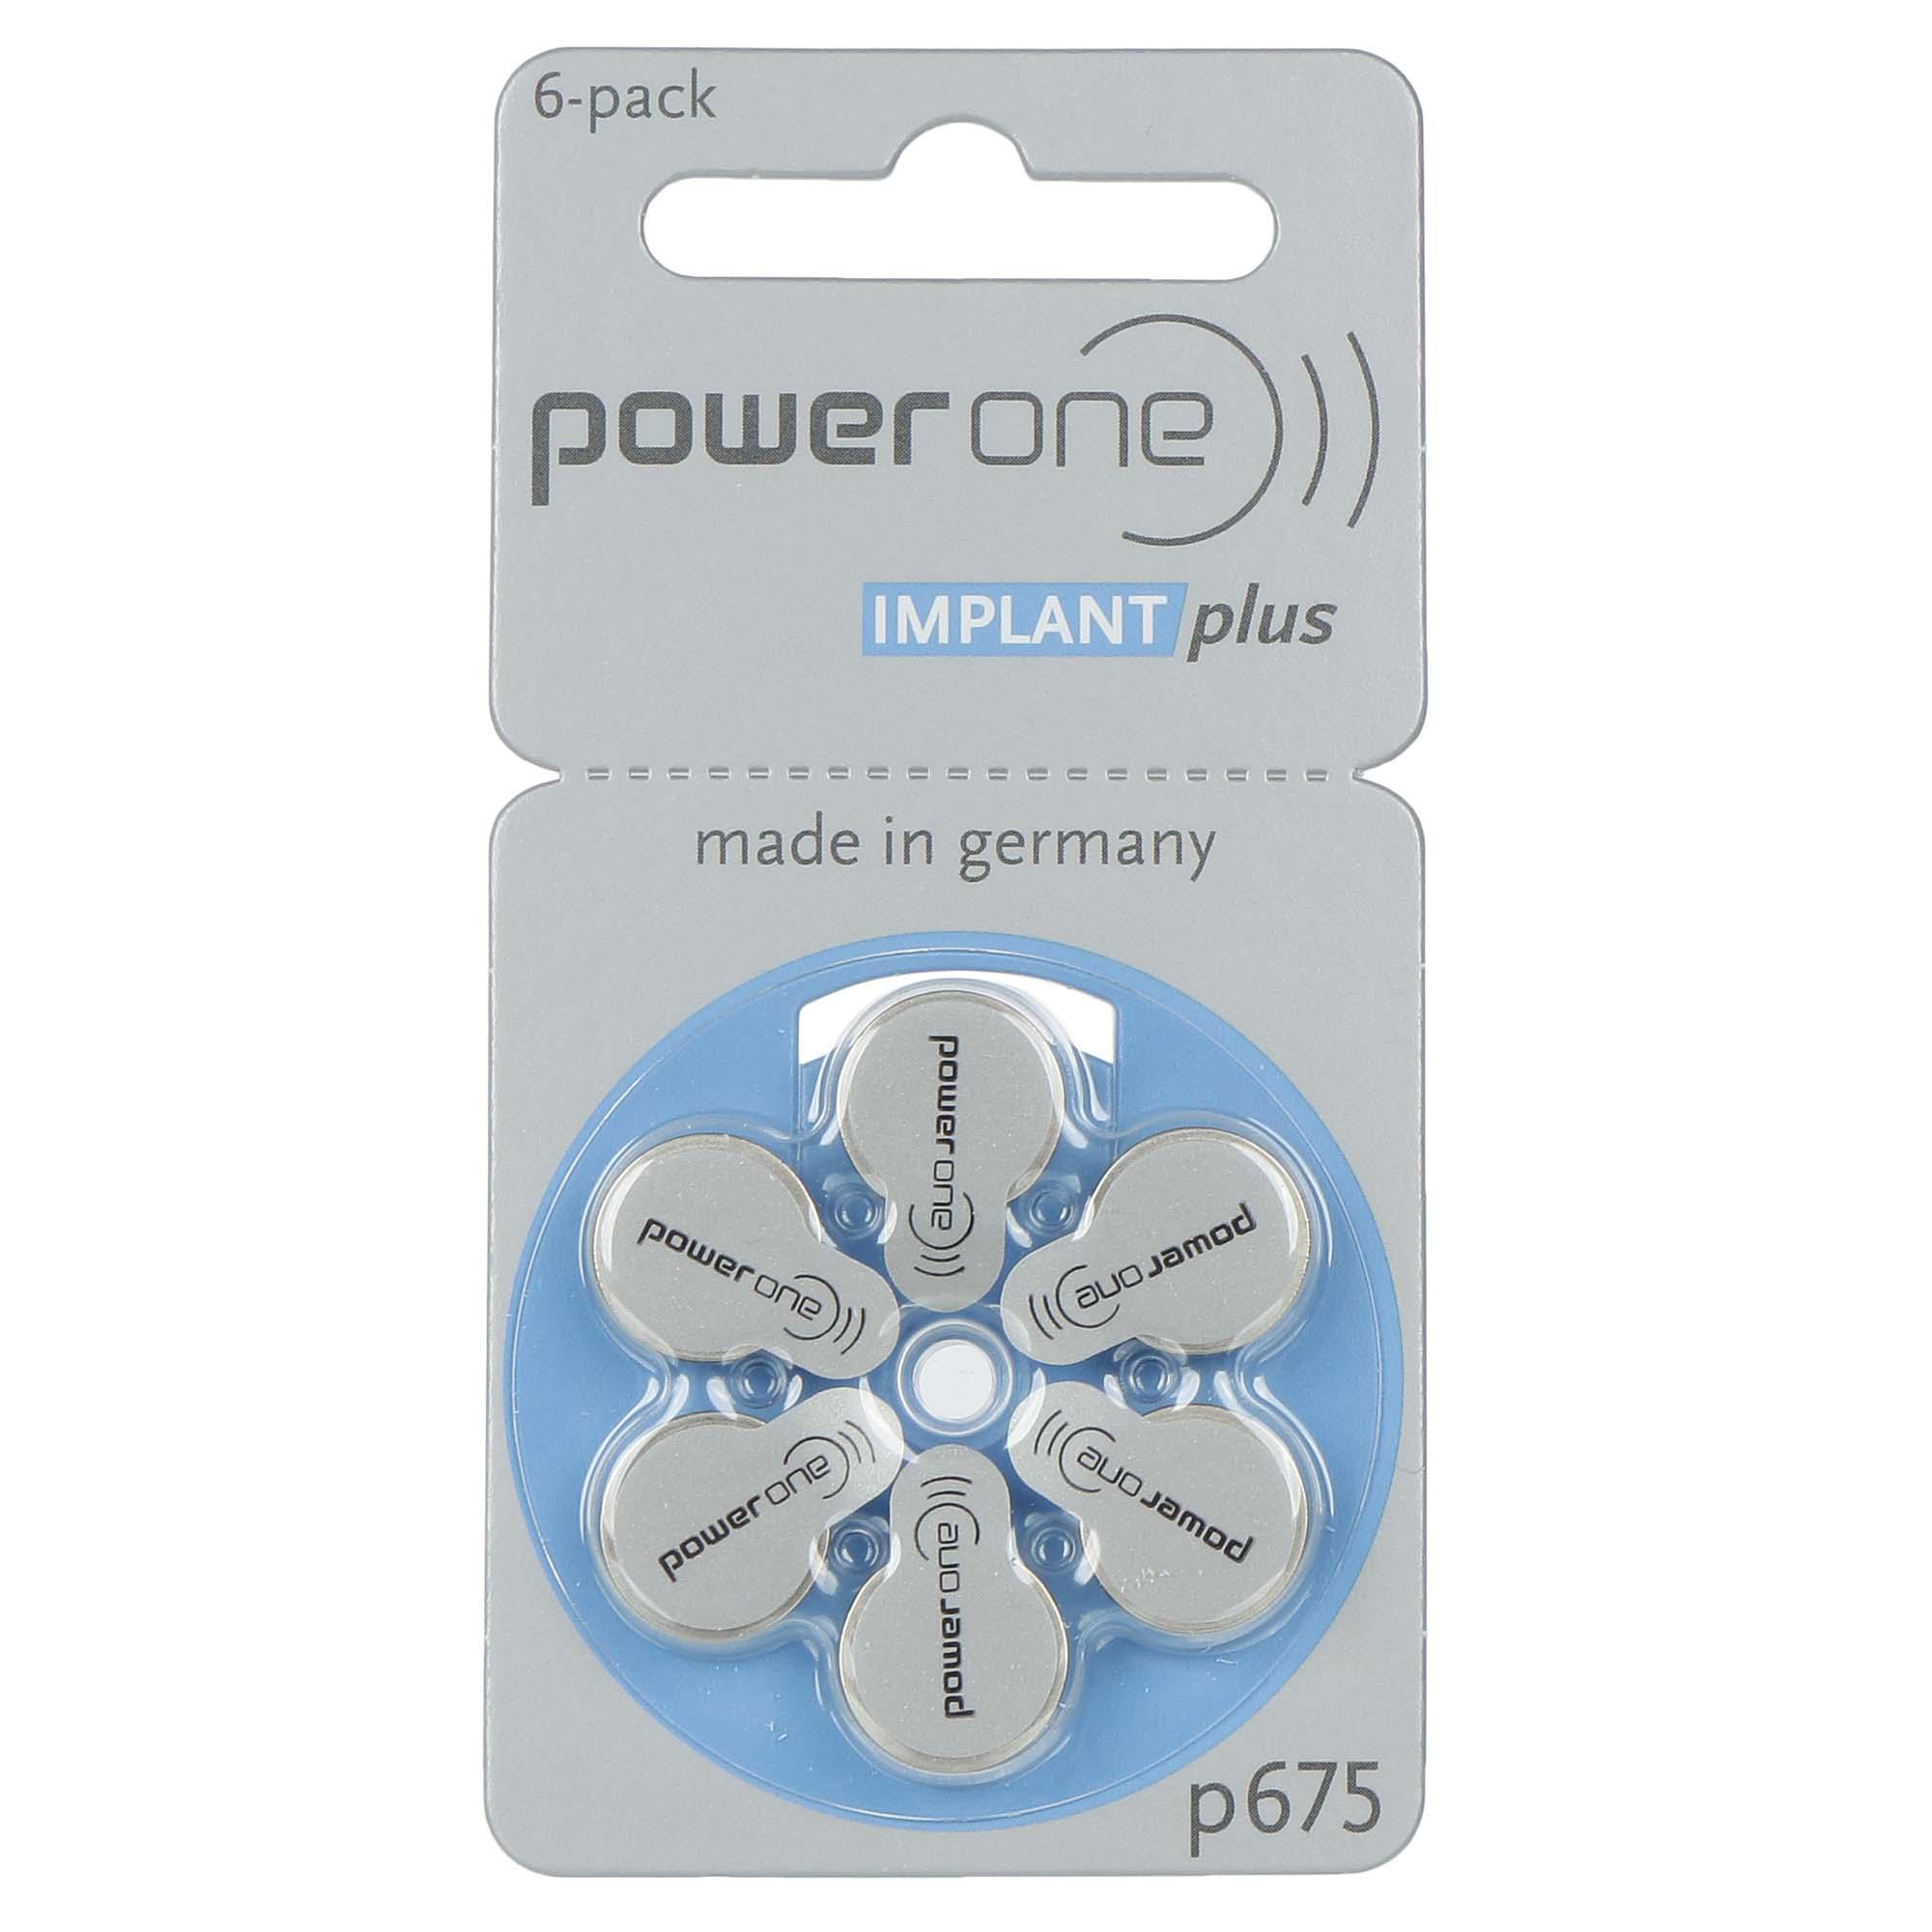 PowerOne P675 (IMPLANT PLUS)  - 10 Cartelas - 60 Baterias para Implante Coclear  - SONORA